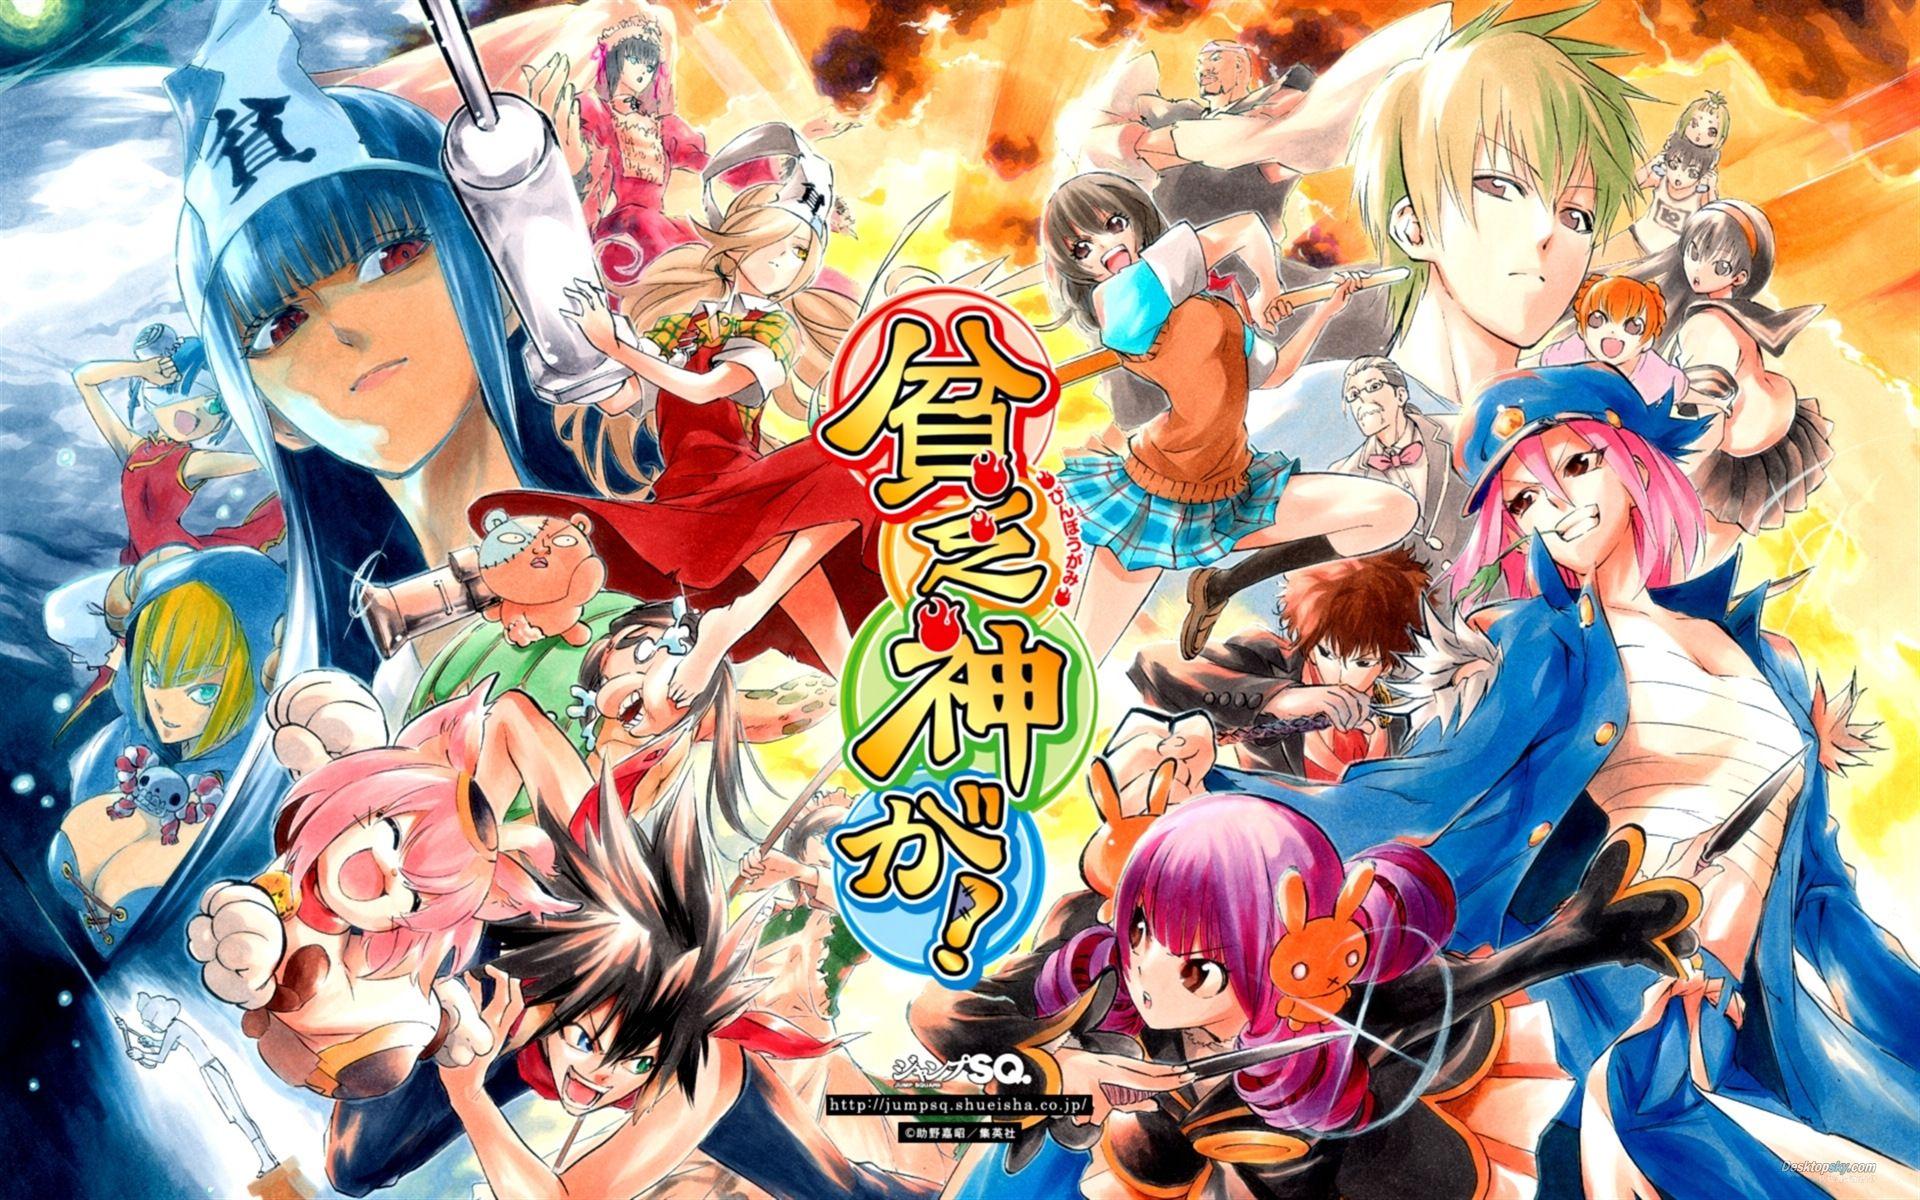 Binbōgami ga! Arte de anime, Sobrenatural y Anime